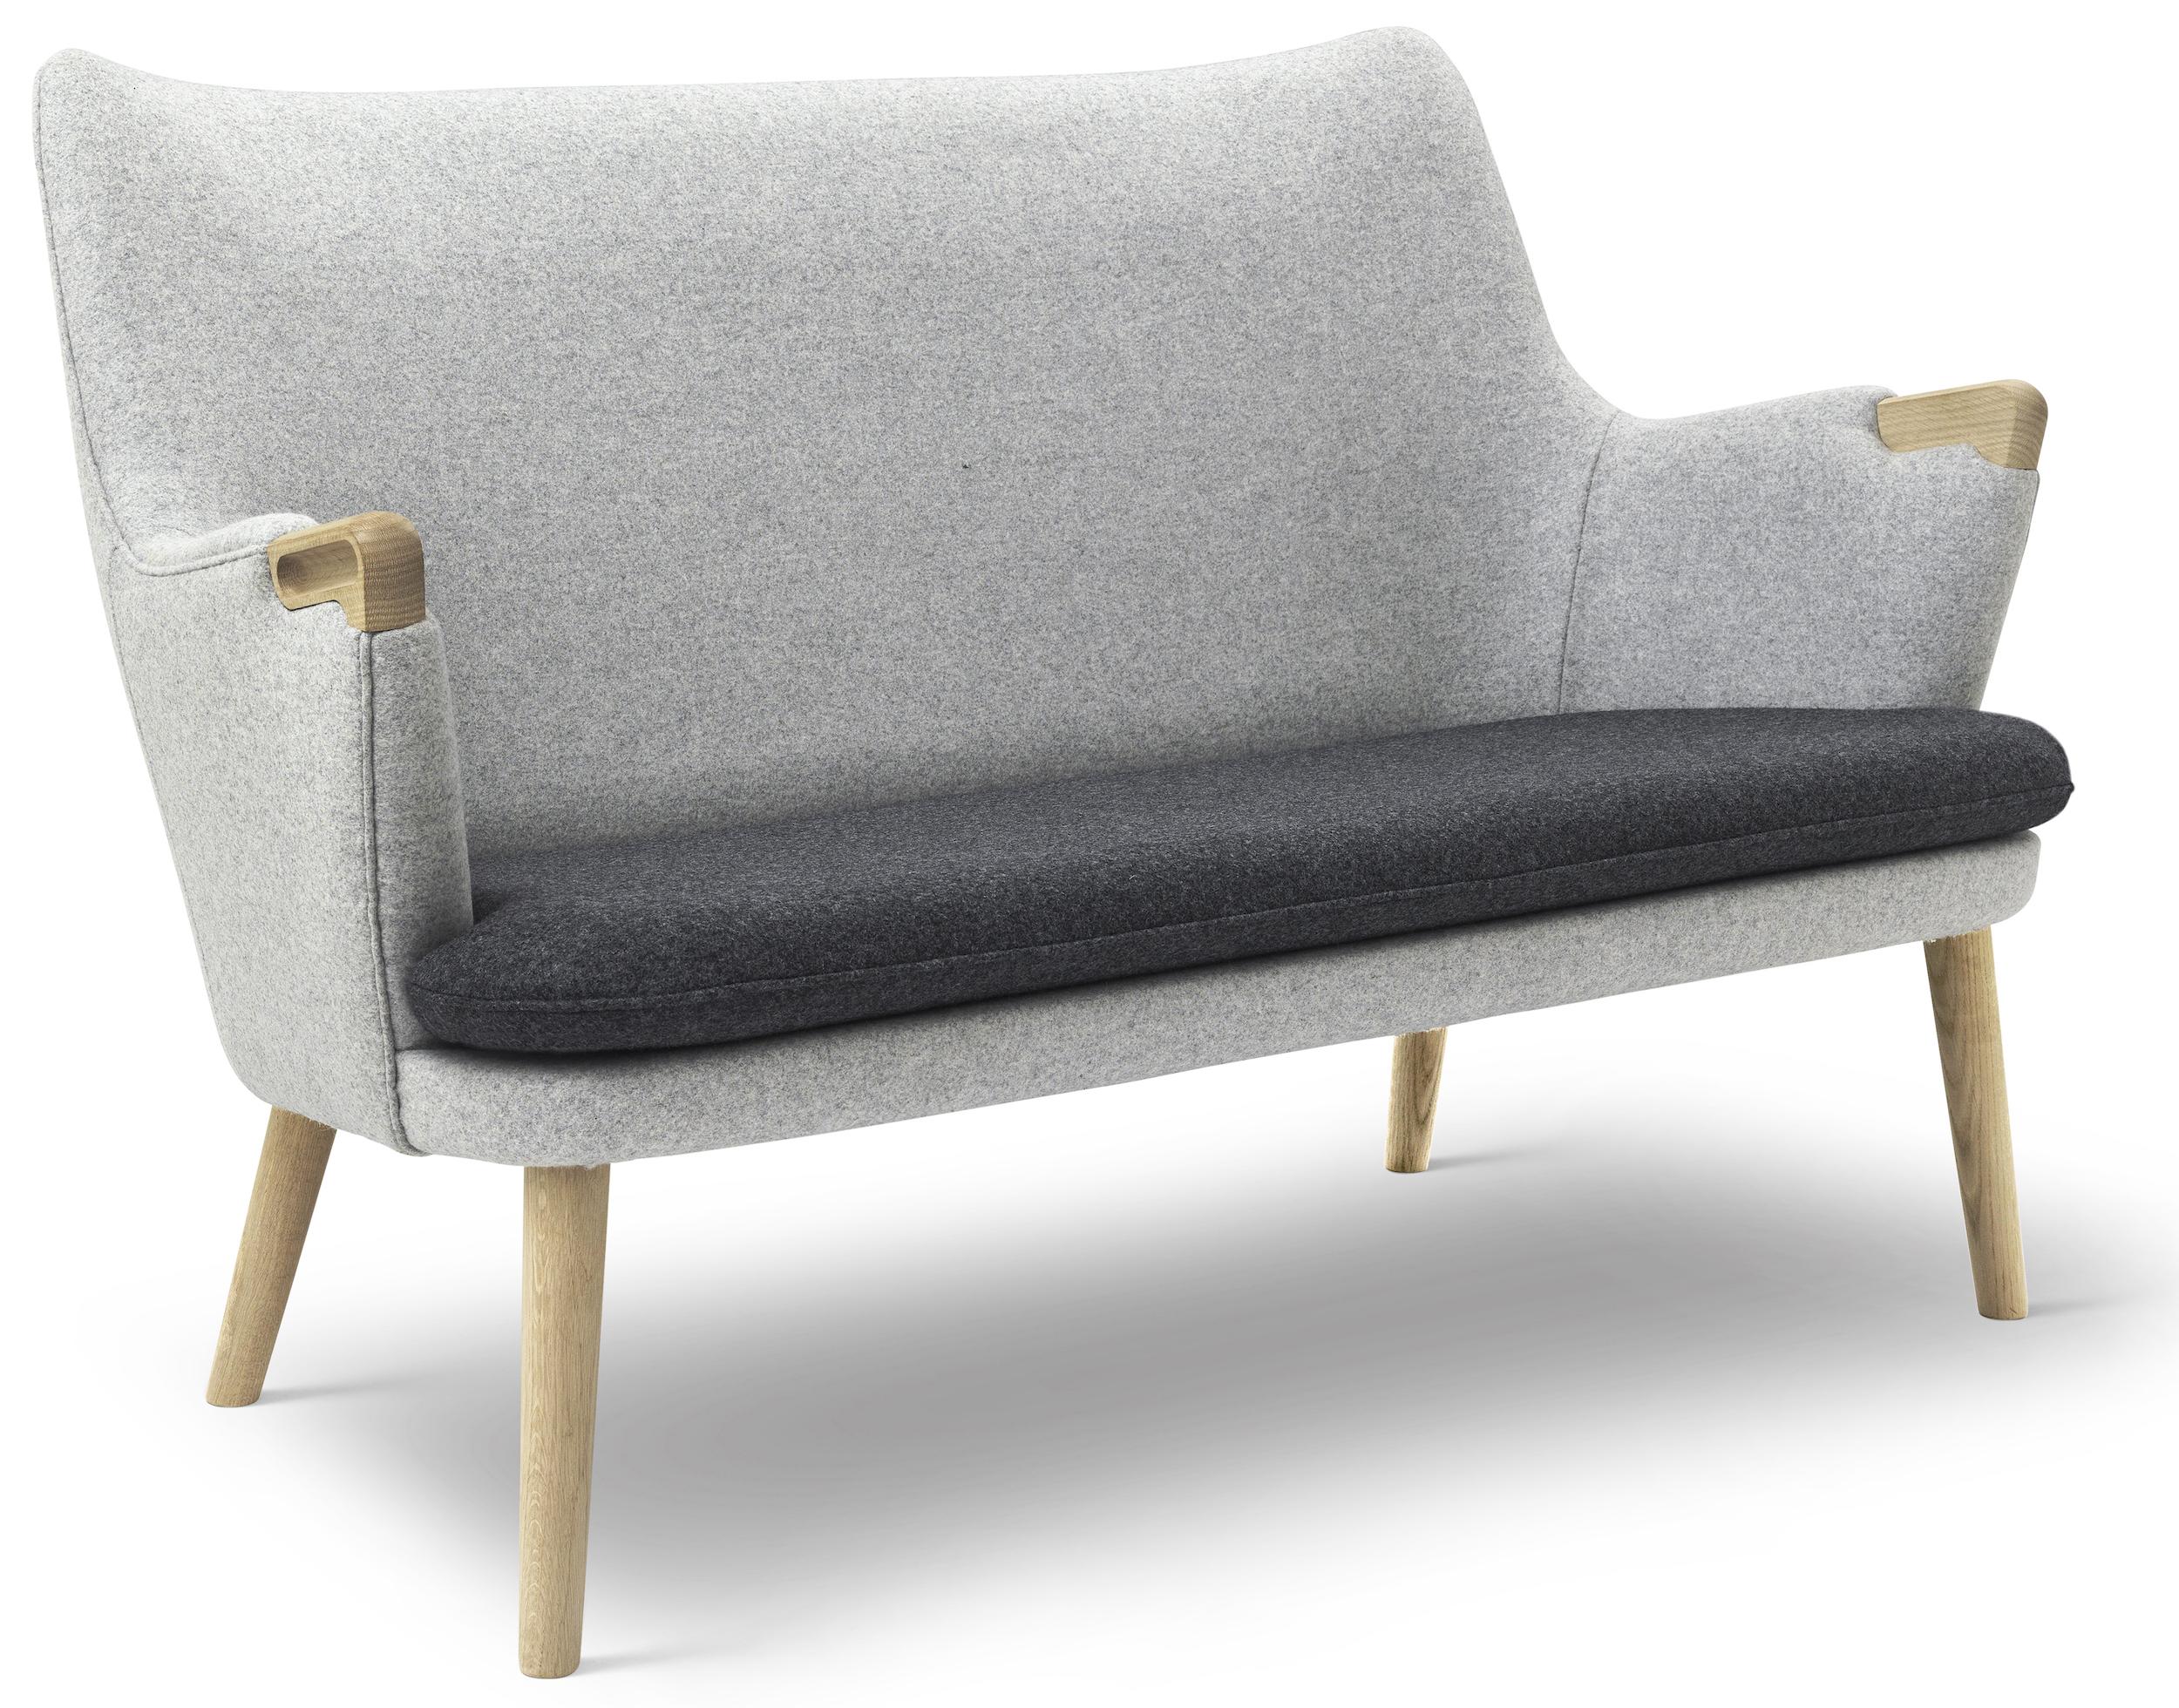 Carl Hansen Amp S 248 N Ch71 Lounge Chair Amp Ch72 Two Seater